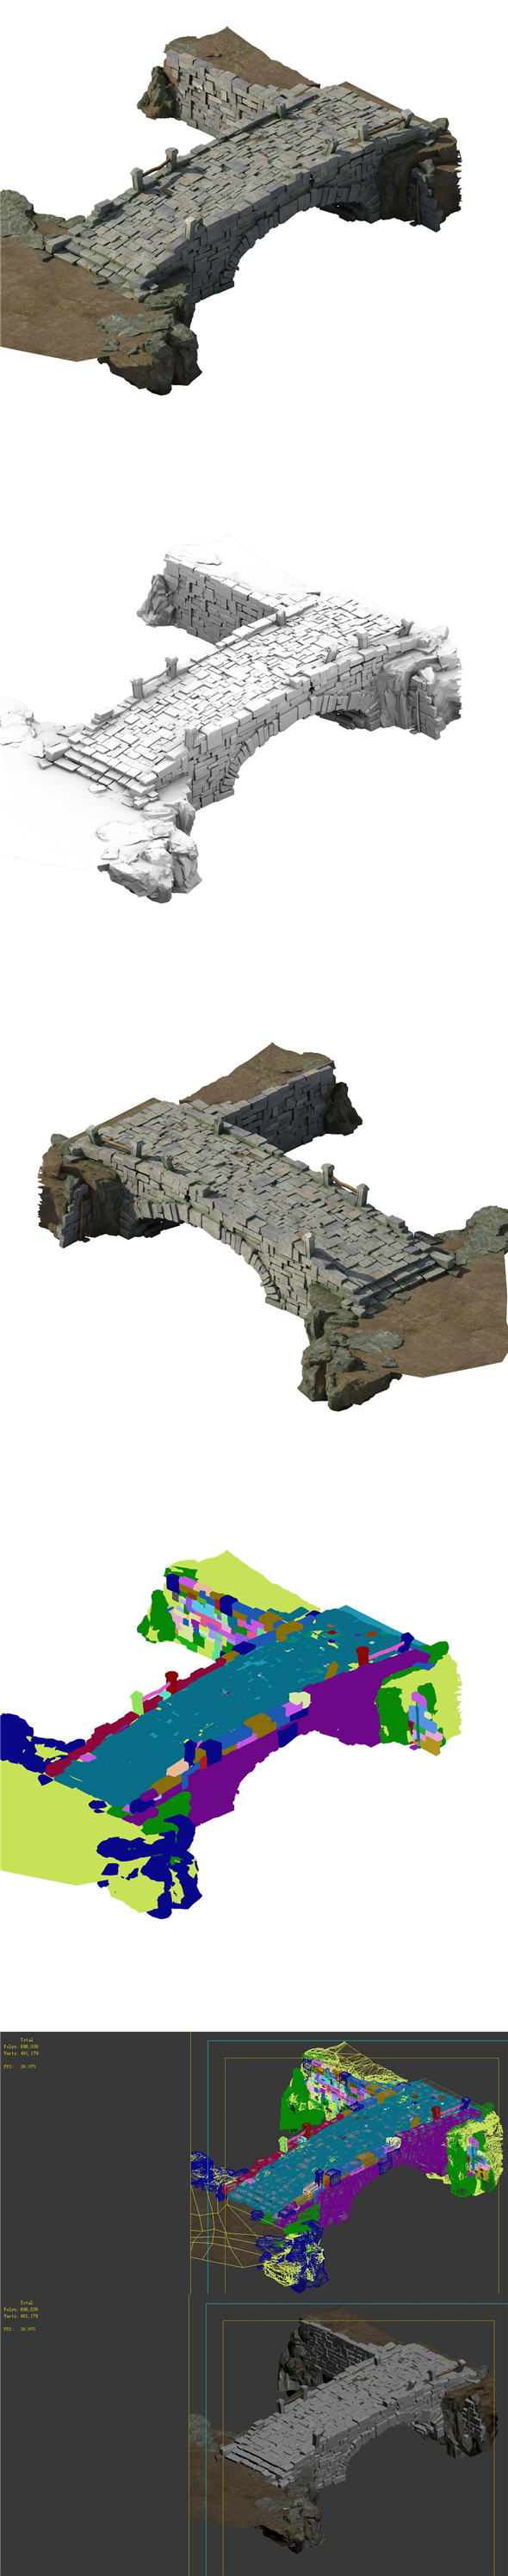 Village - stone bridge - 3DOcean Item for Sale